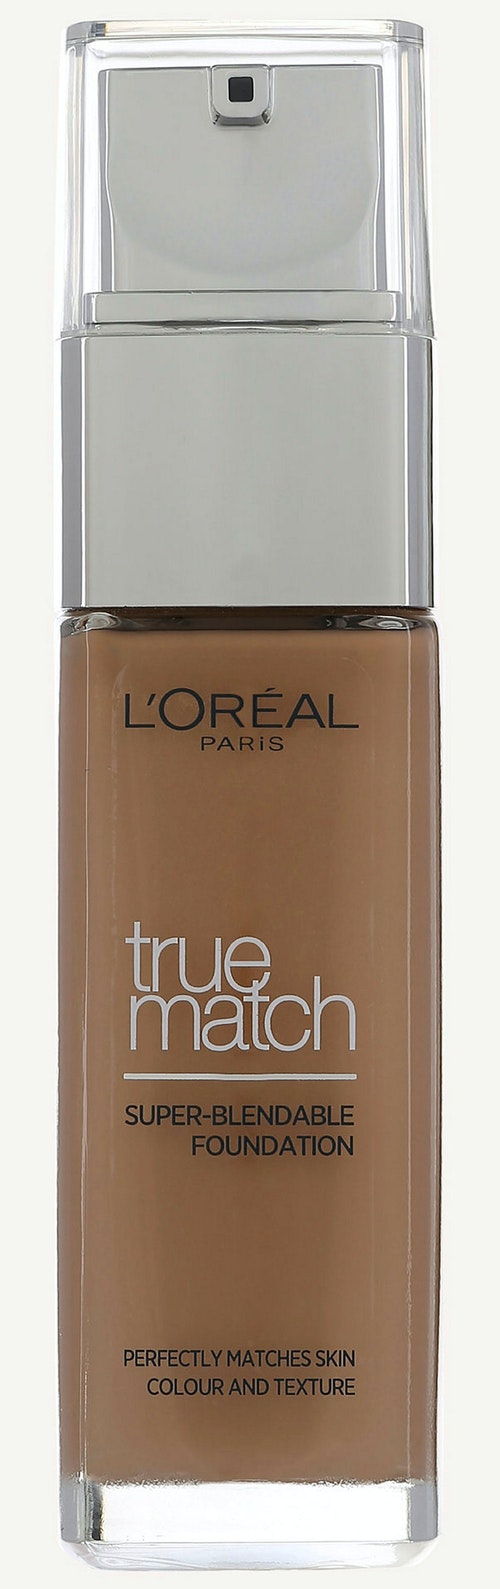 L'Oreal True Match Amber Gold 7D/7W Foundation 1 stk